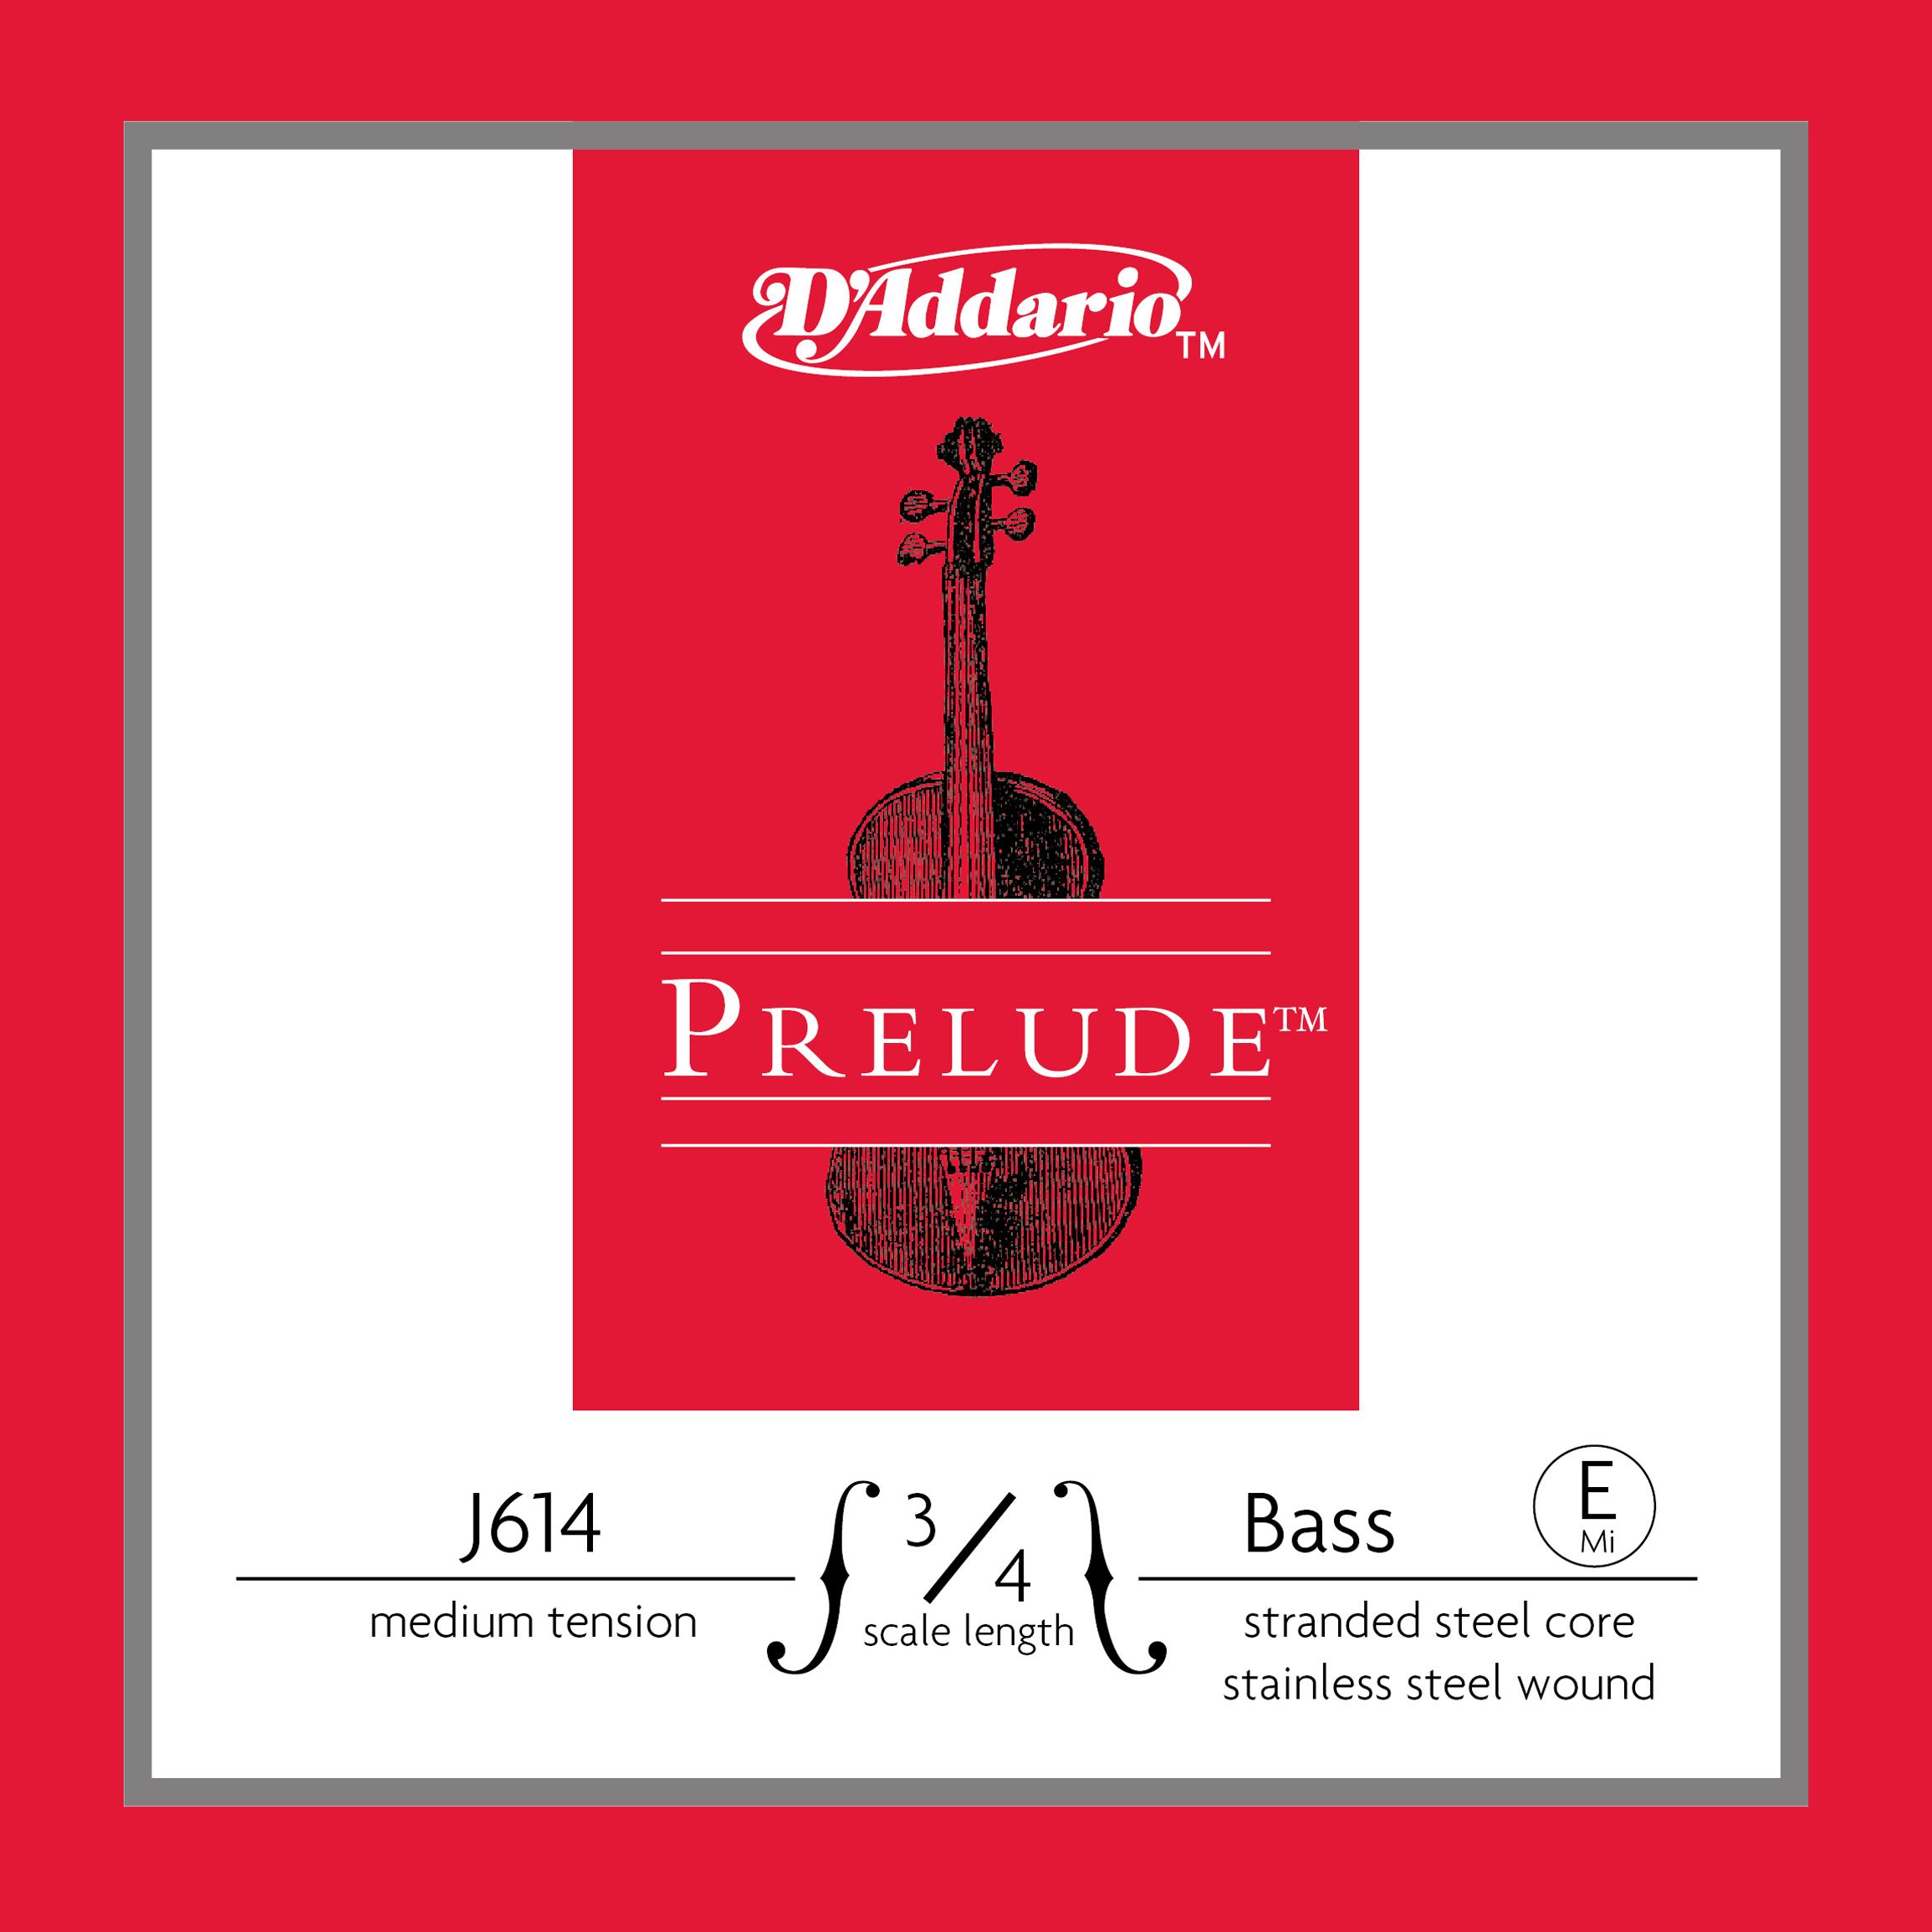 D'Addario Prelude Bass Single E String, 3/4 Scale, Medium Tension